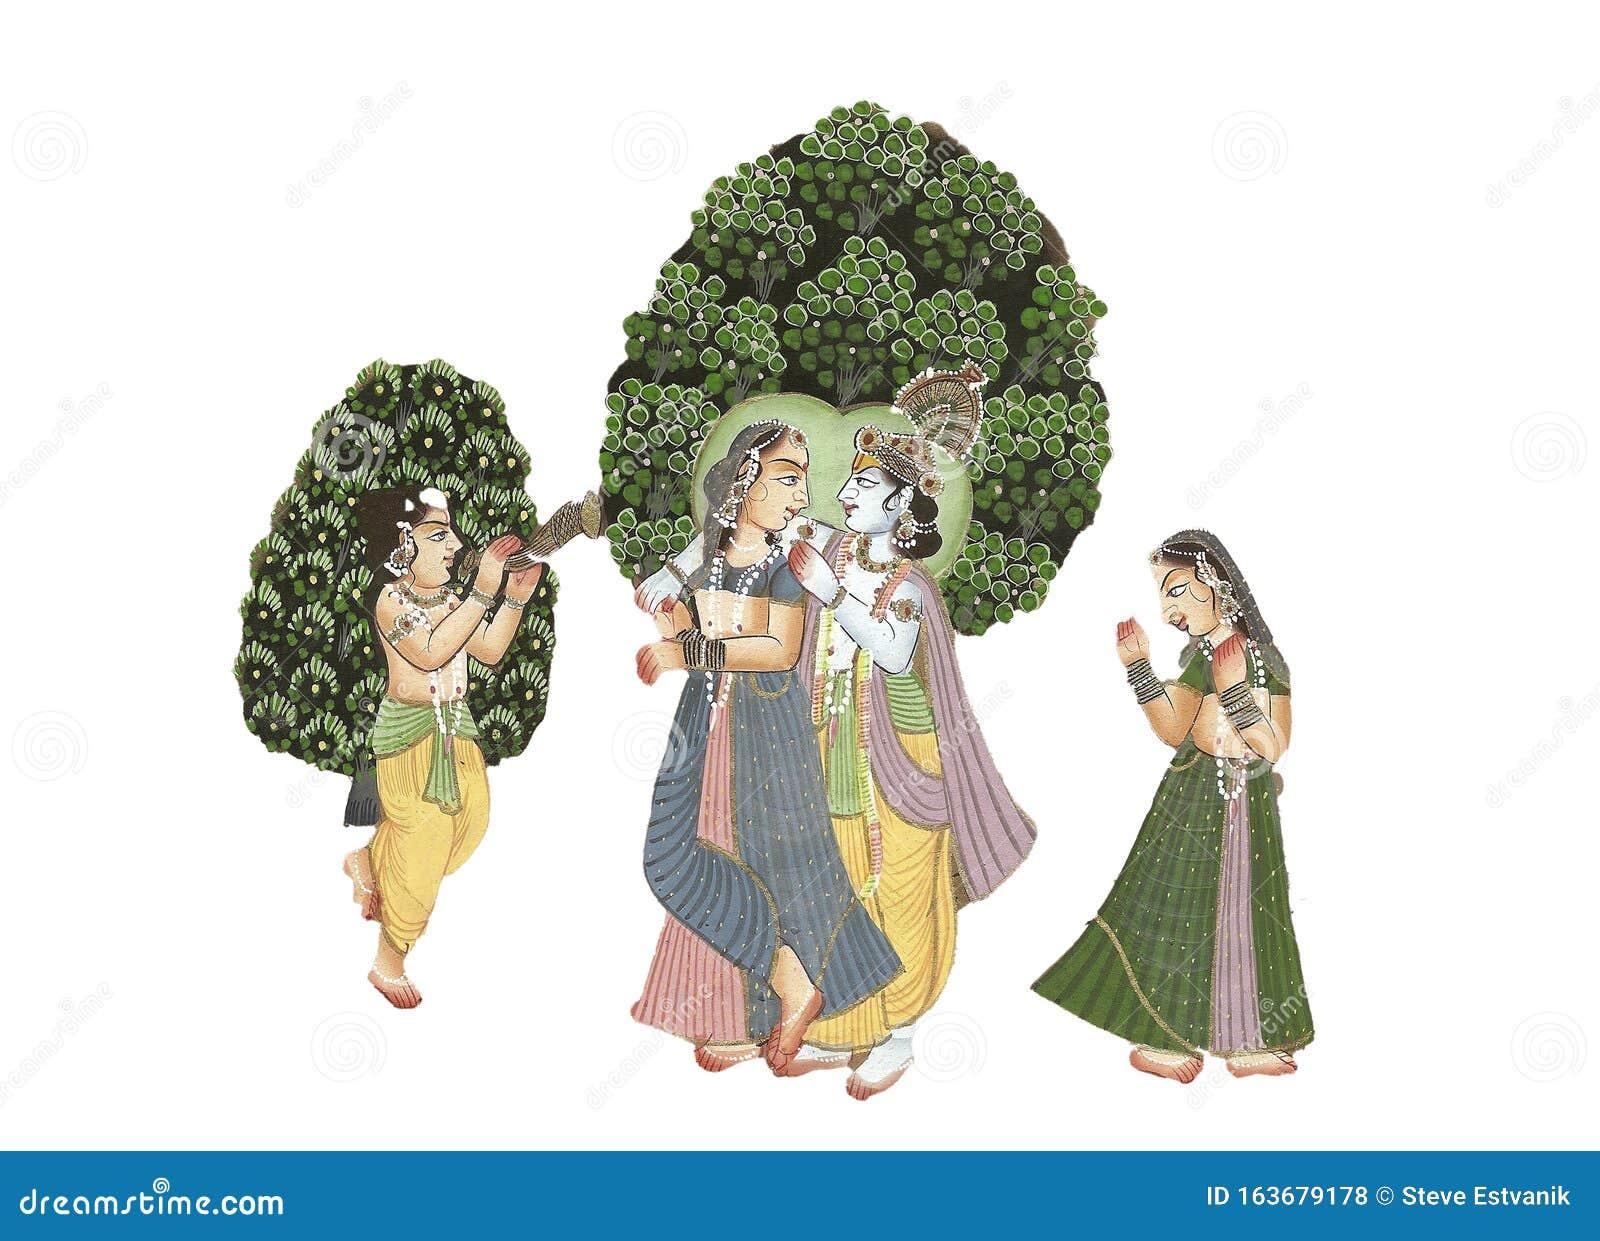 Parvati love